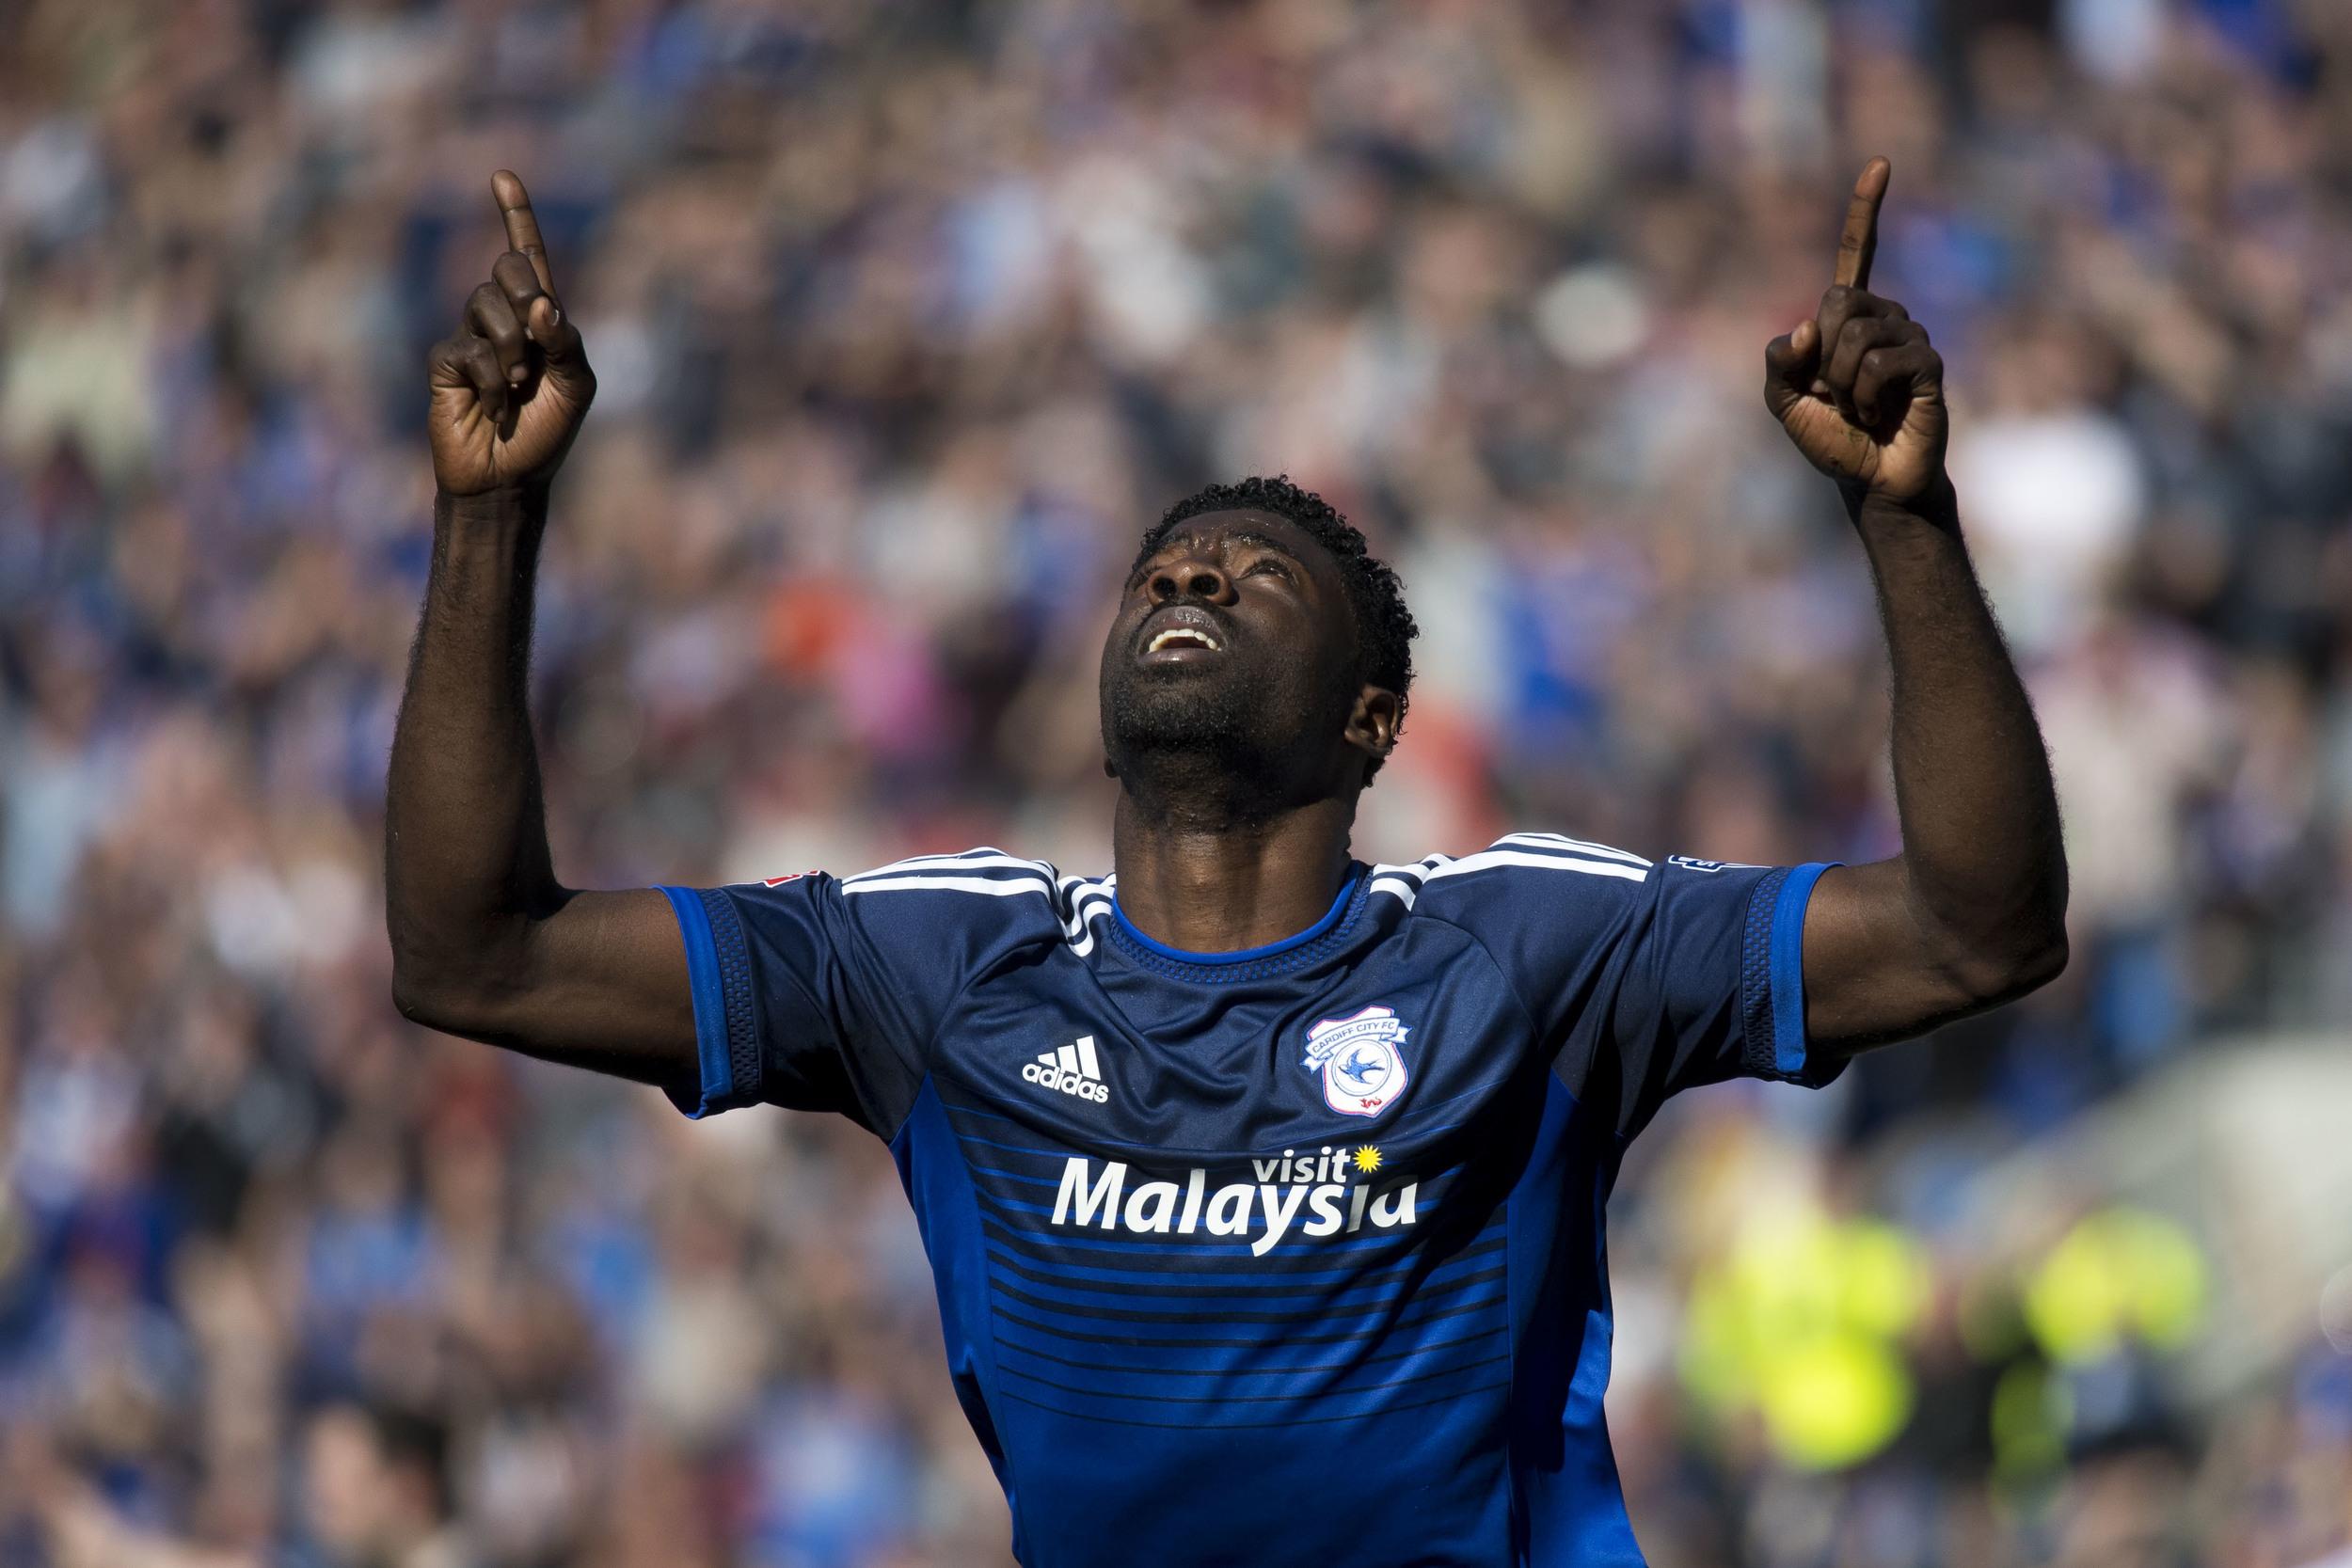 Bruno Manga celebrates after scoring a goal - press photography